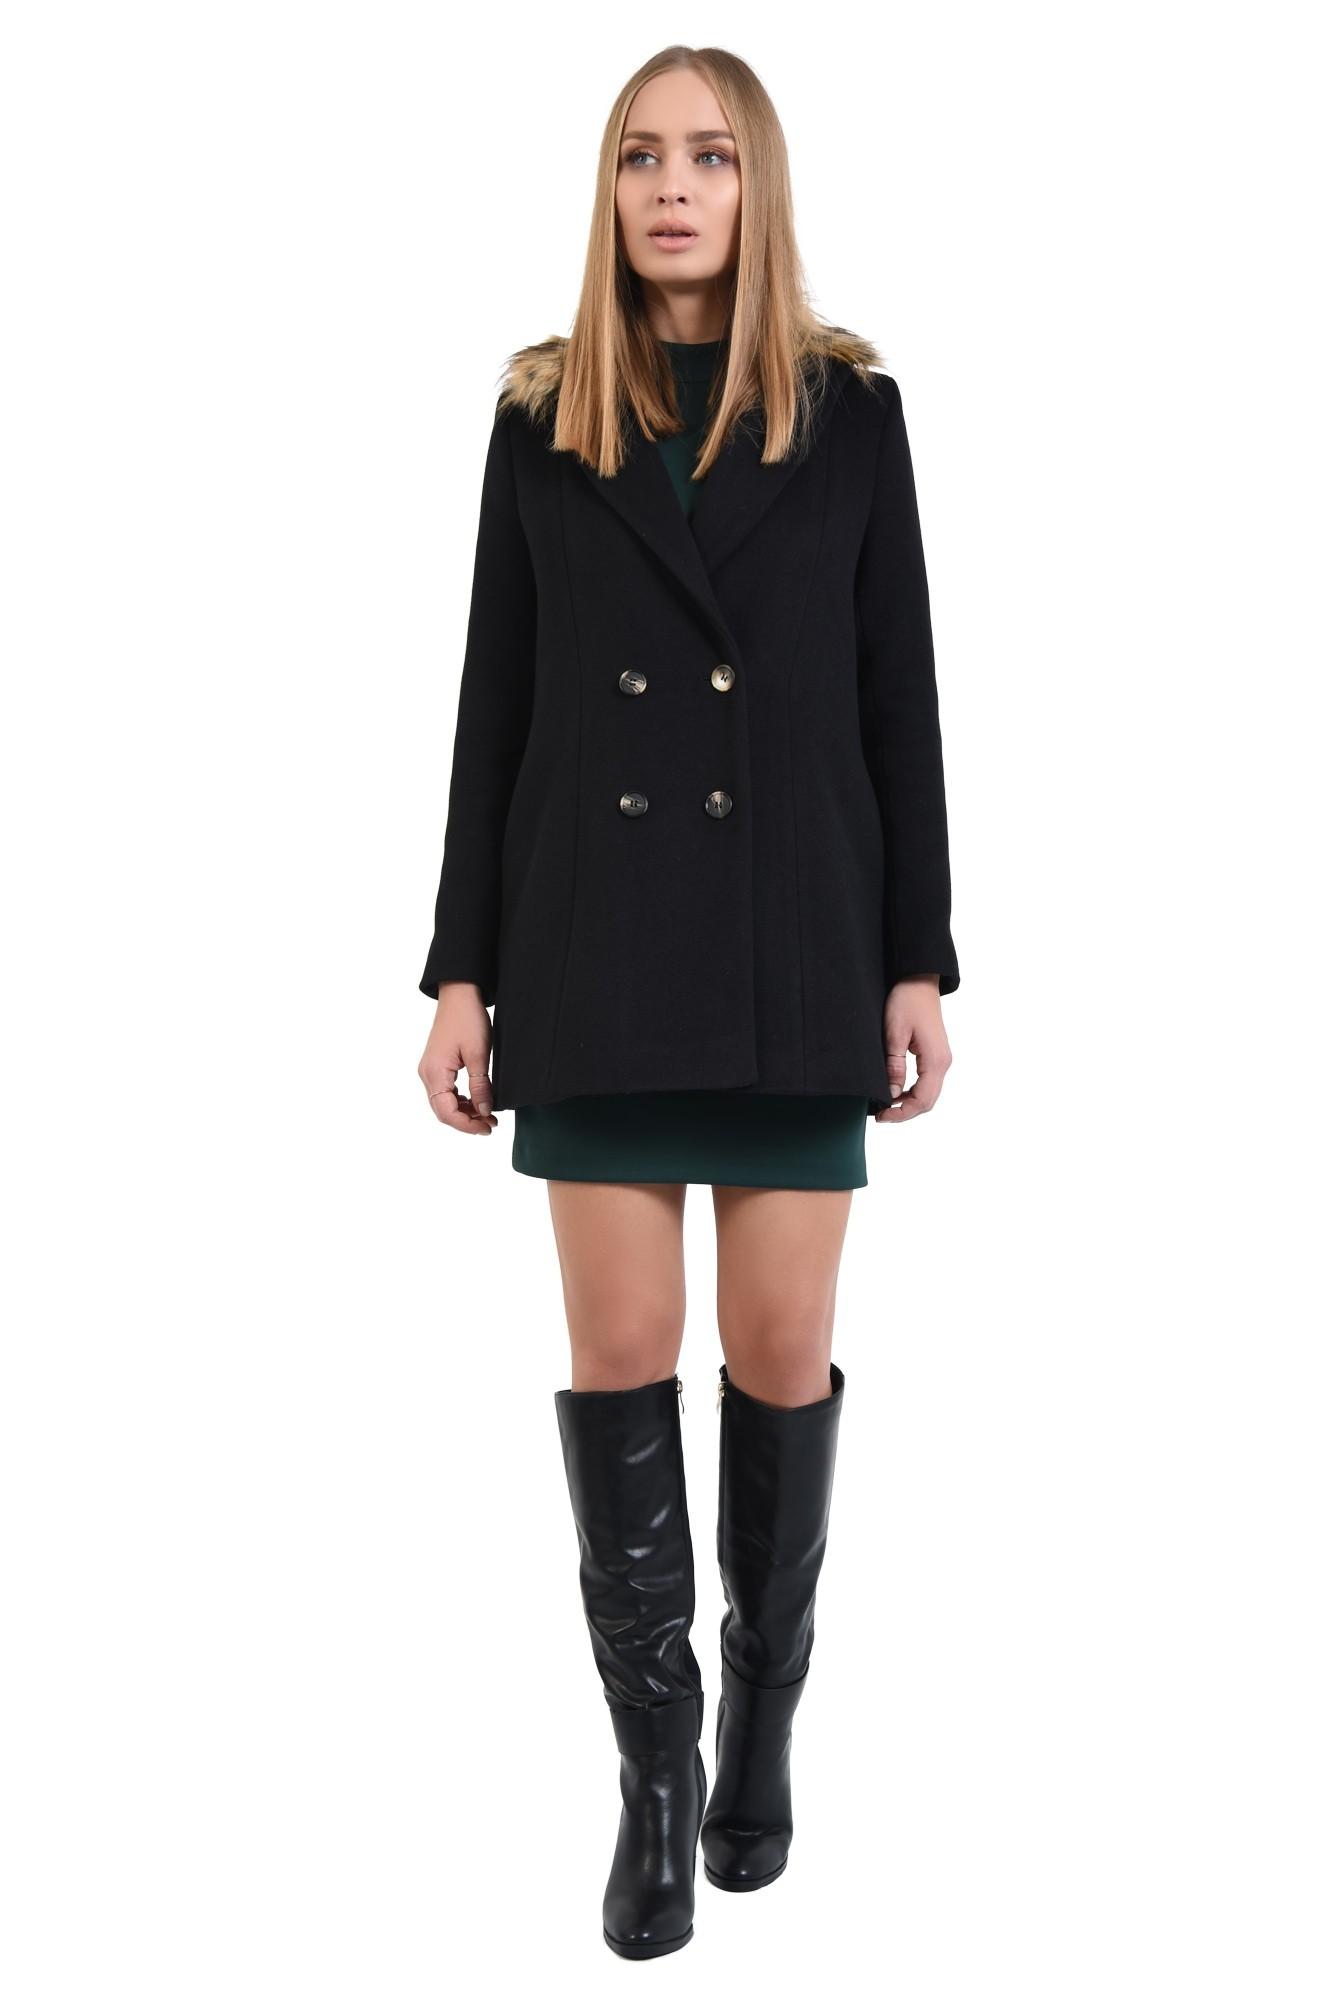 360 - palton negru, croi drept, nasturi, guler detasabil